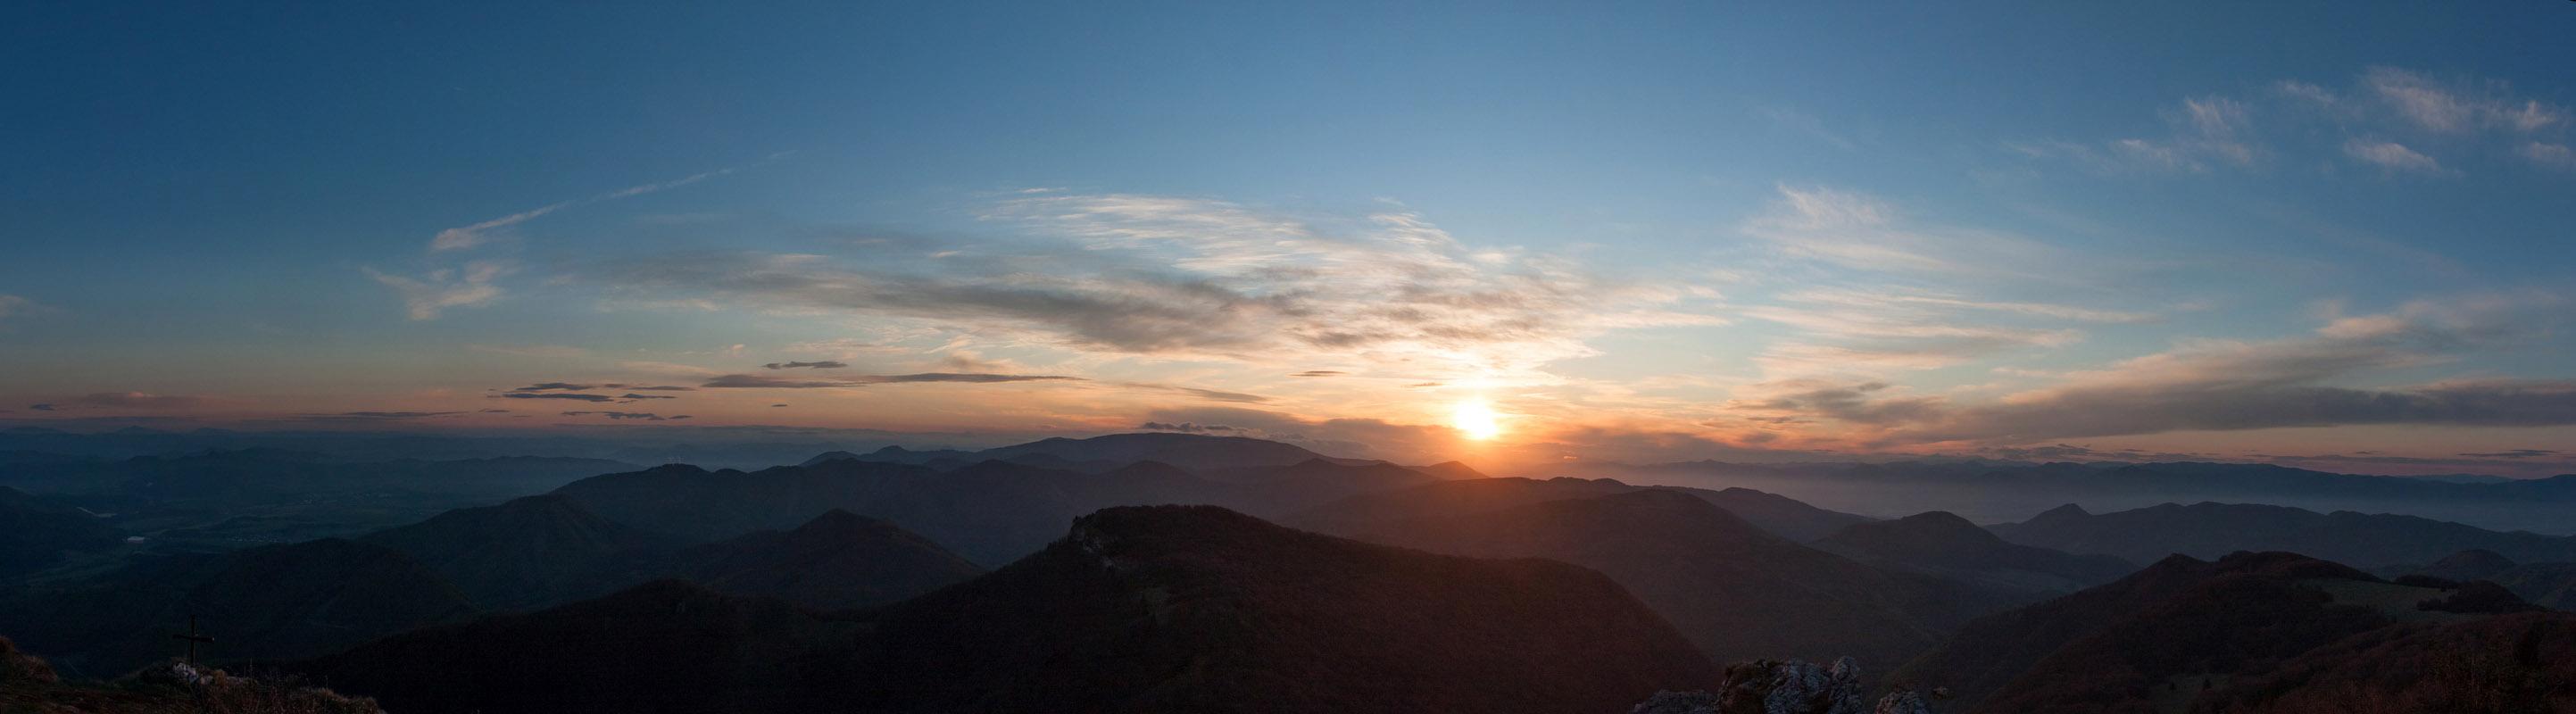 panoráma východu slnka z Kľaku